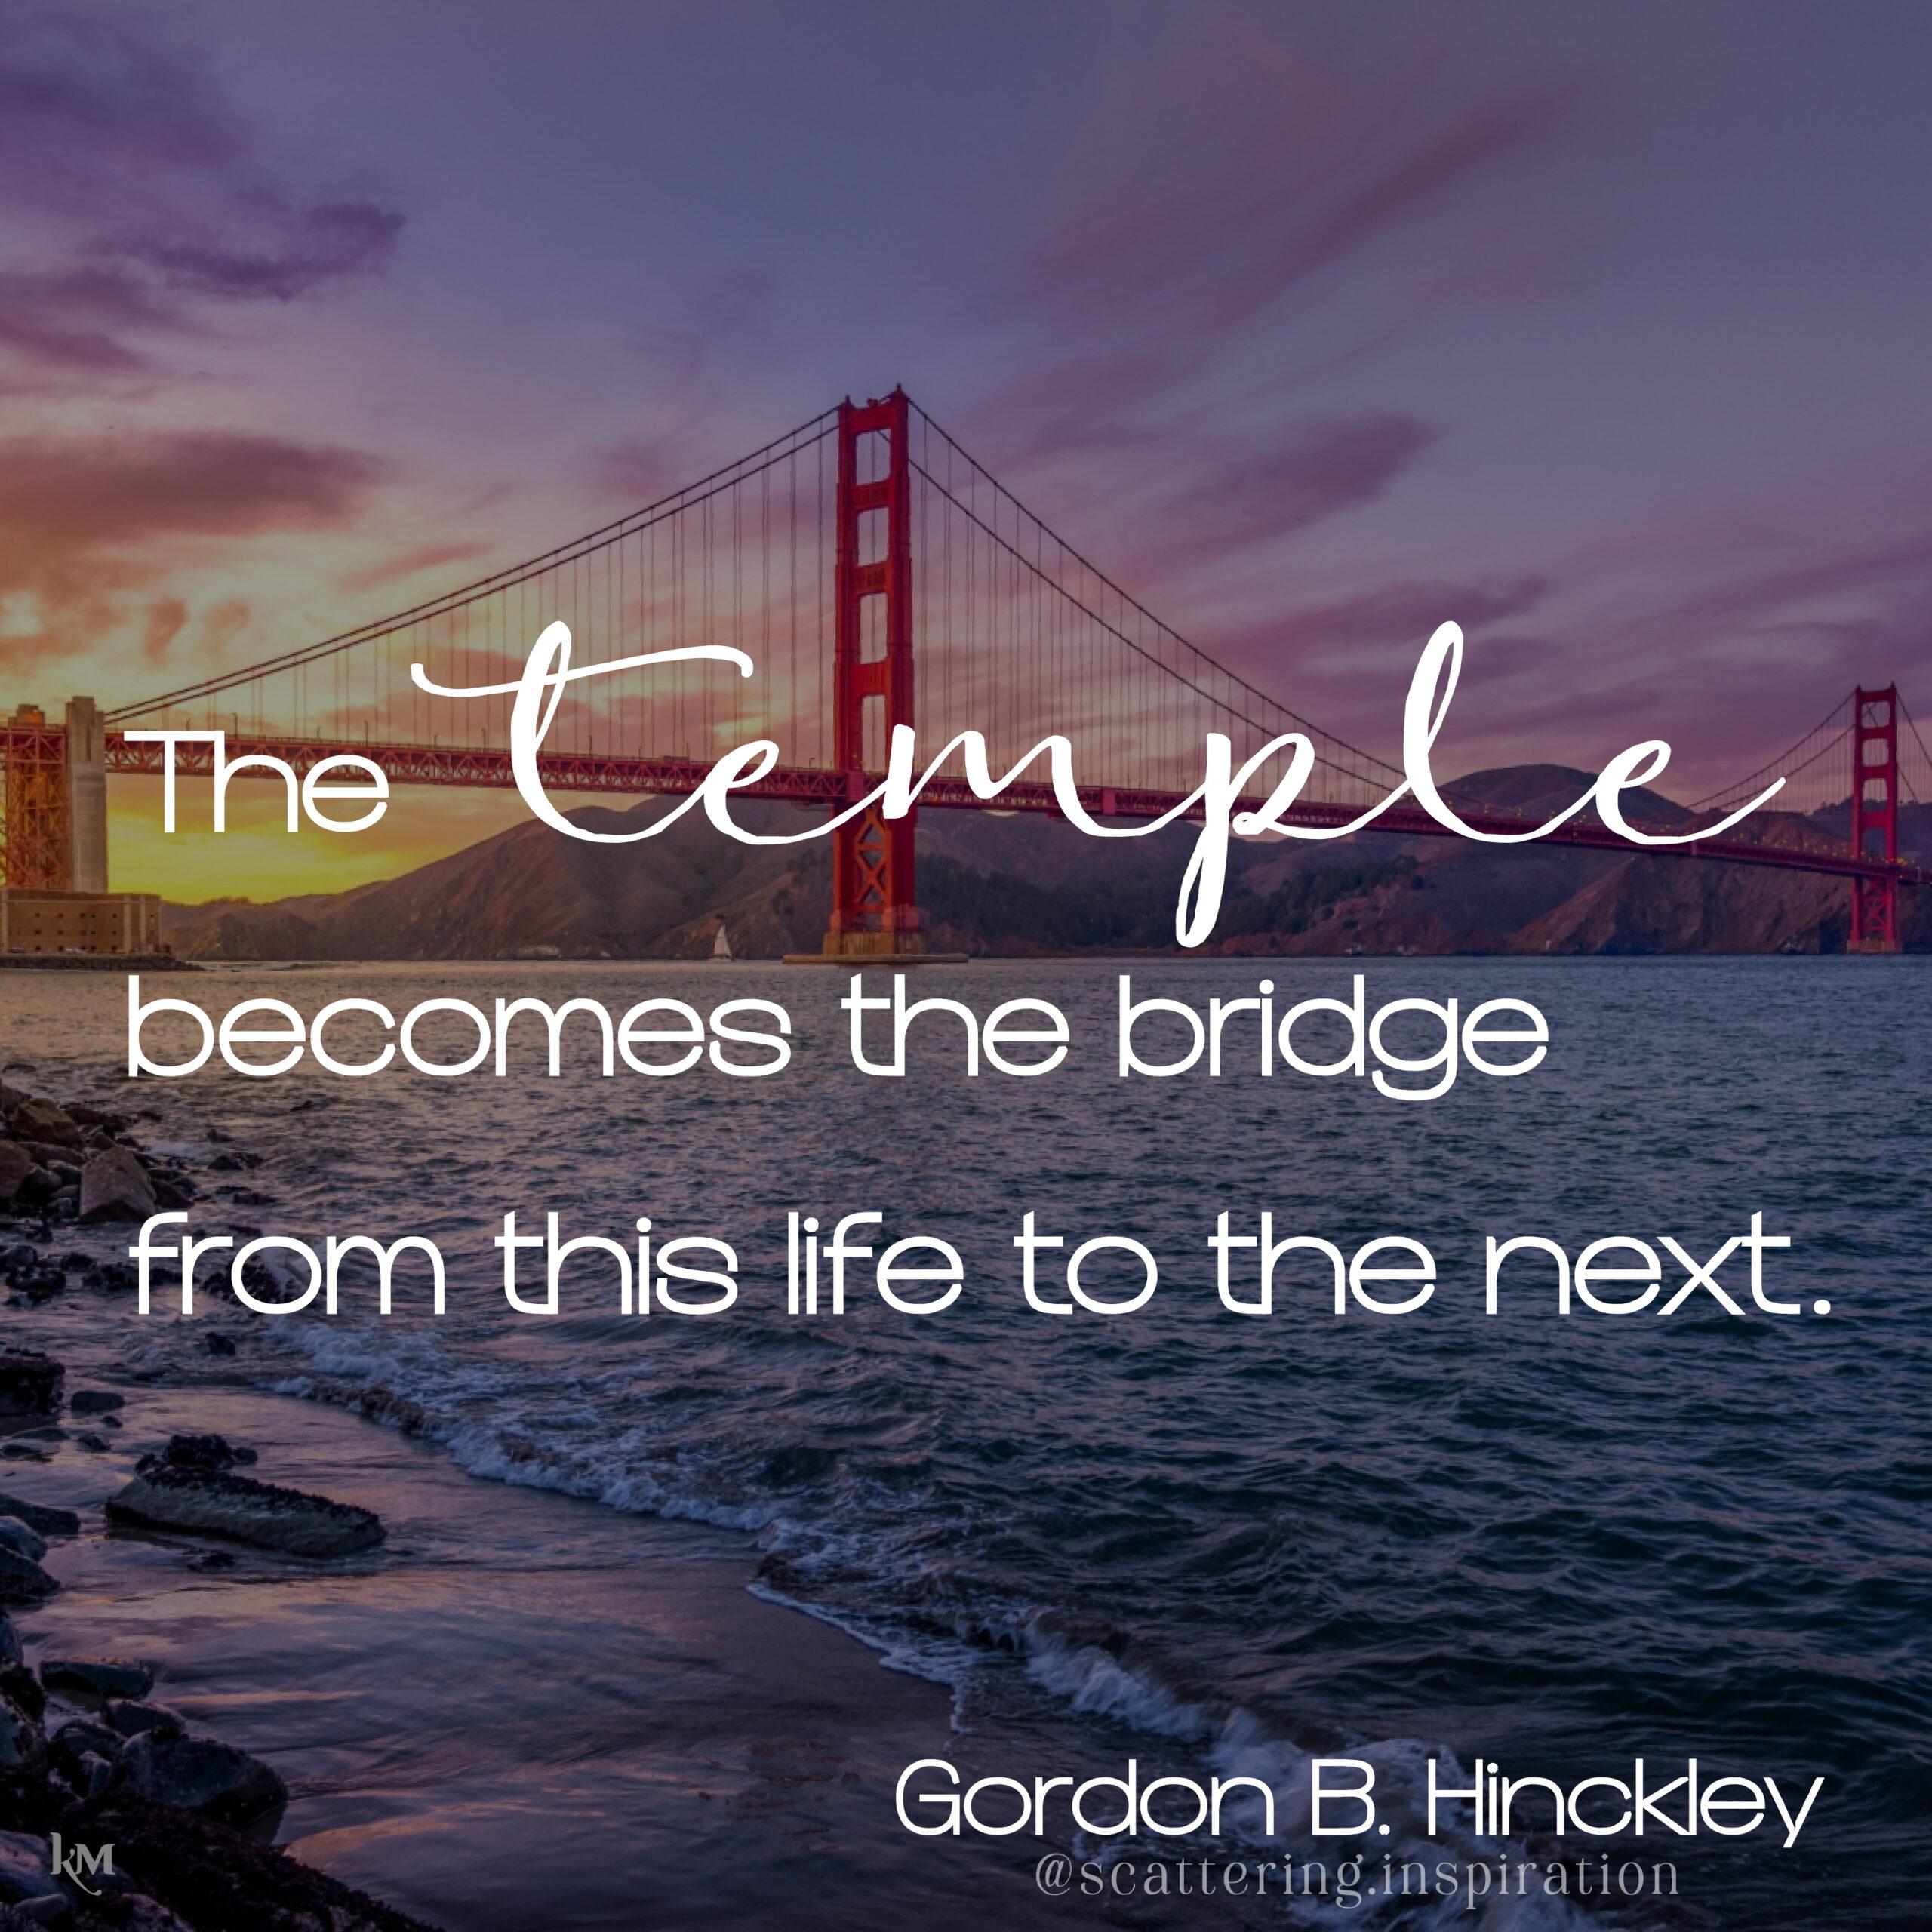 temple becomes the bridge